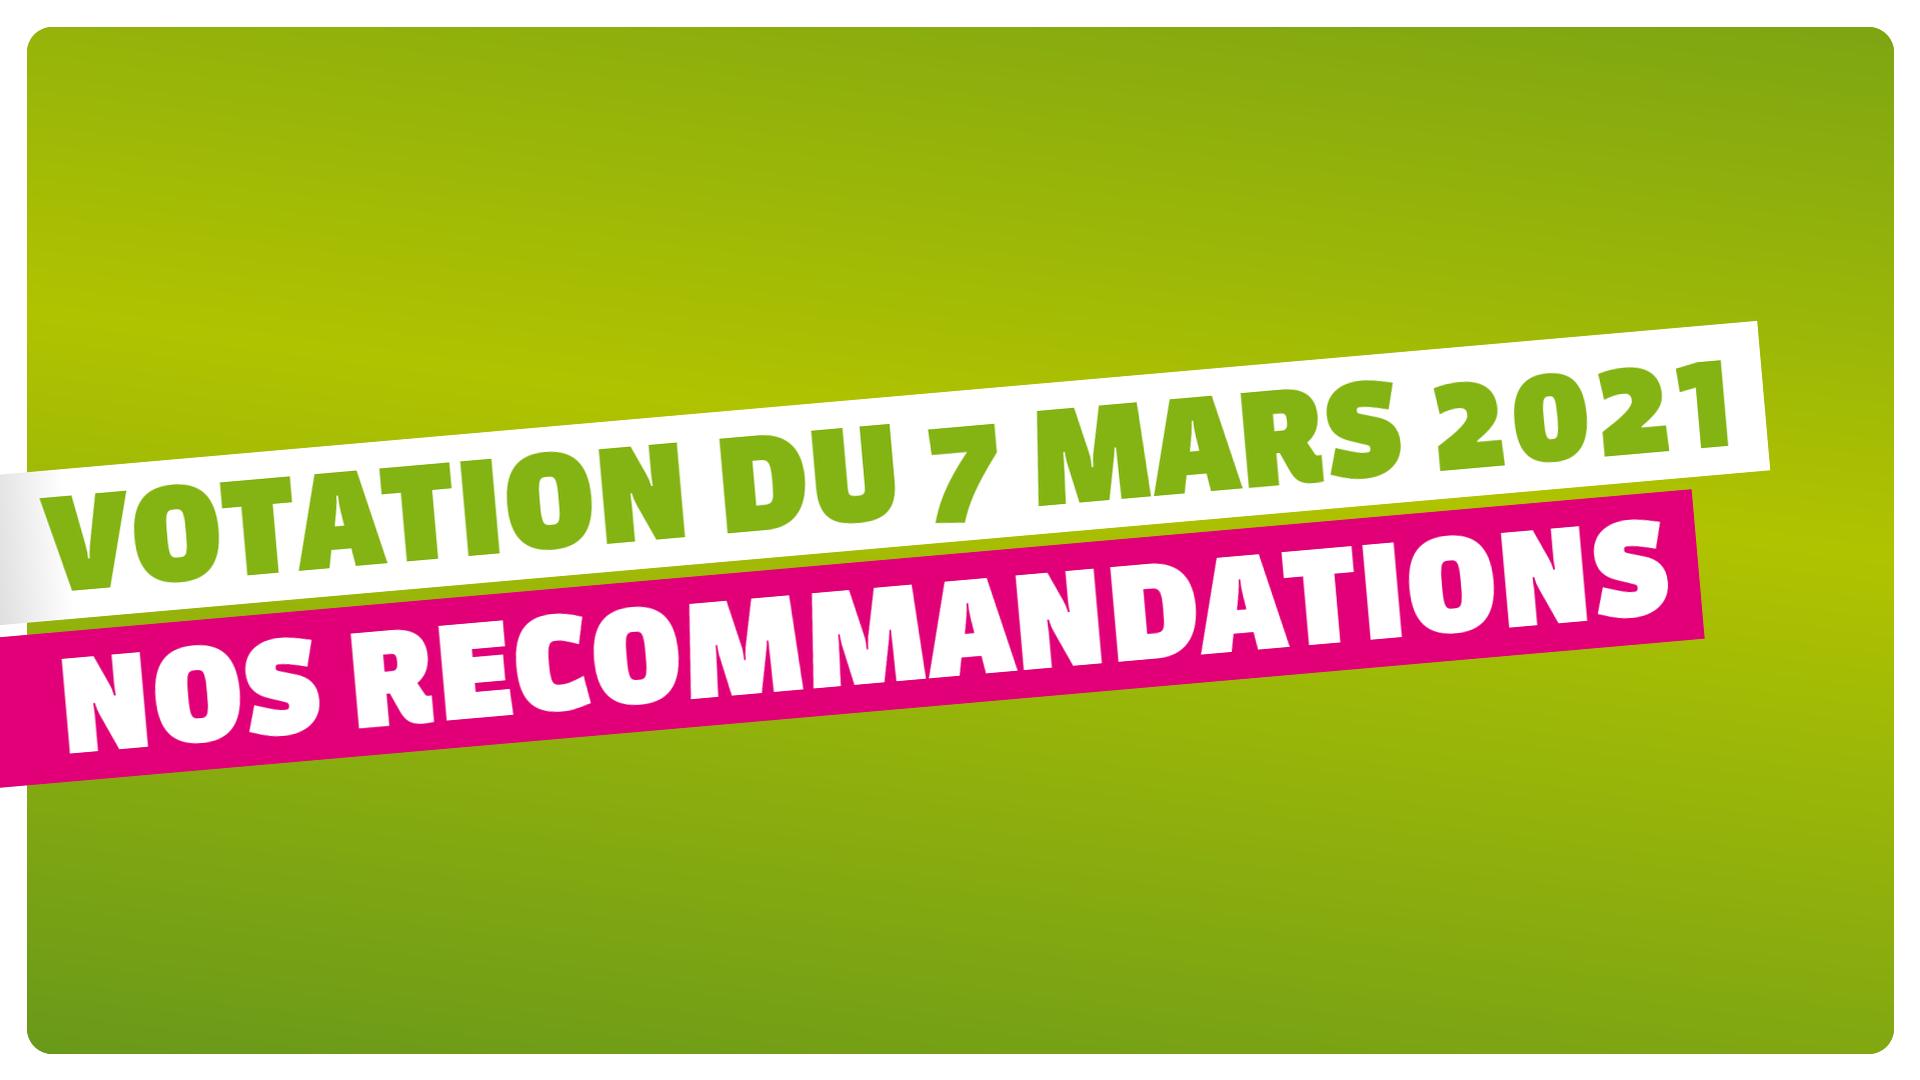 Votation du 7 mars - nos recommandations